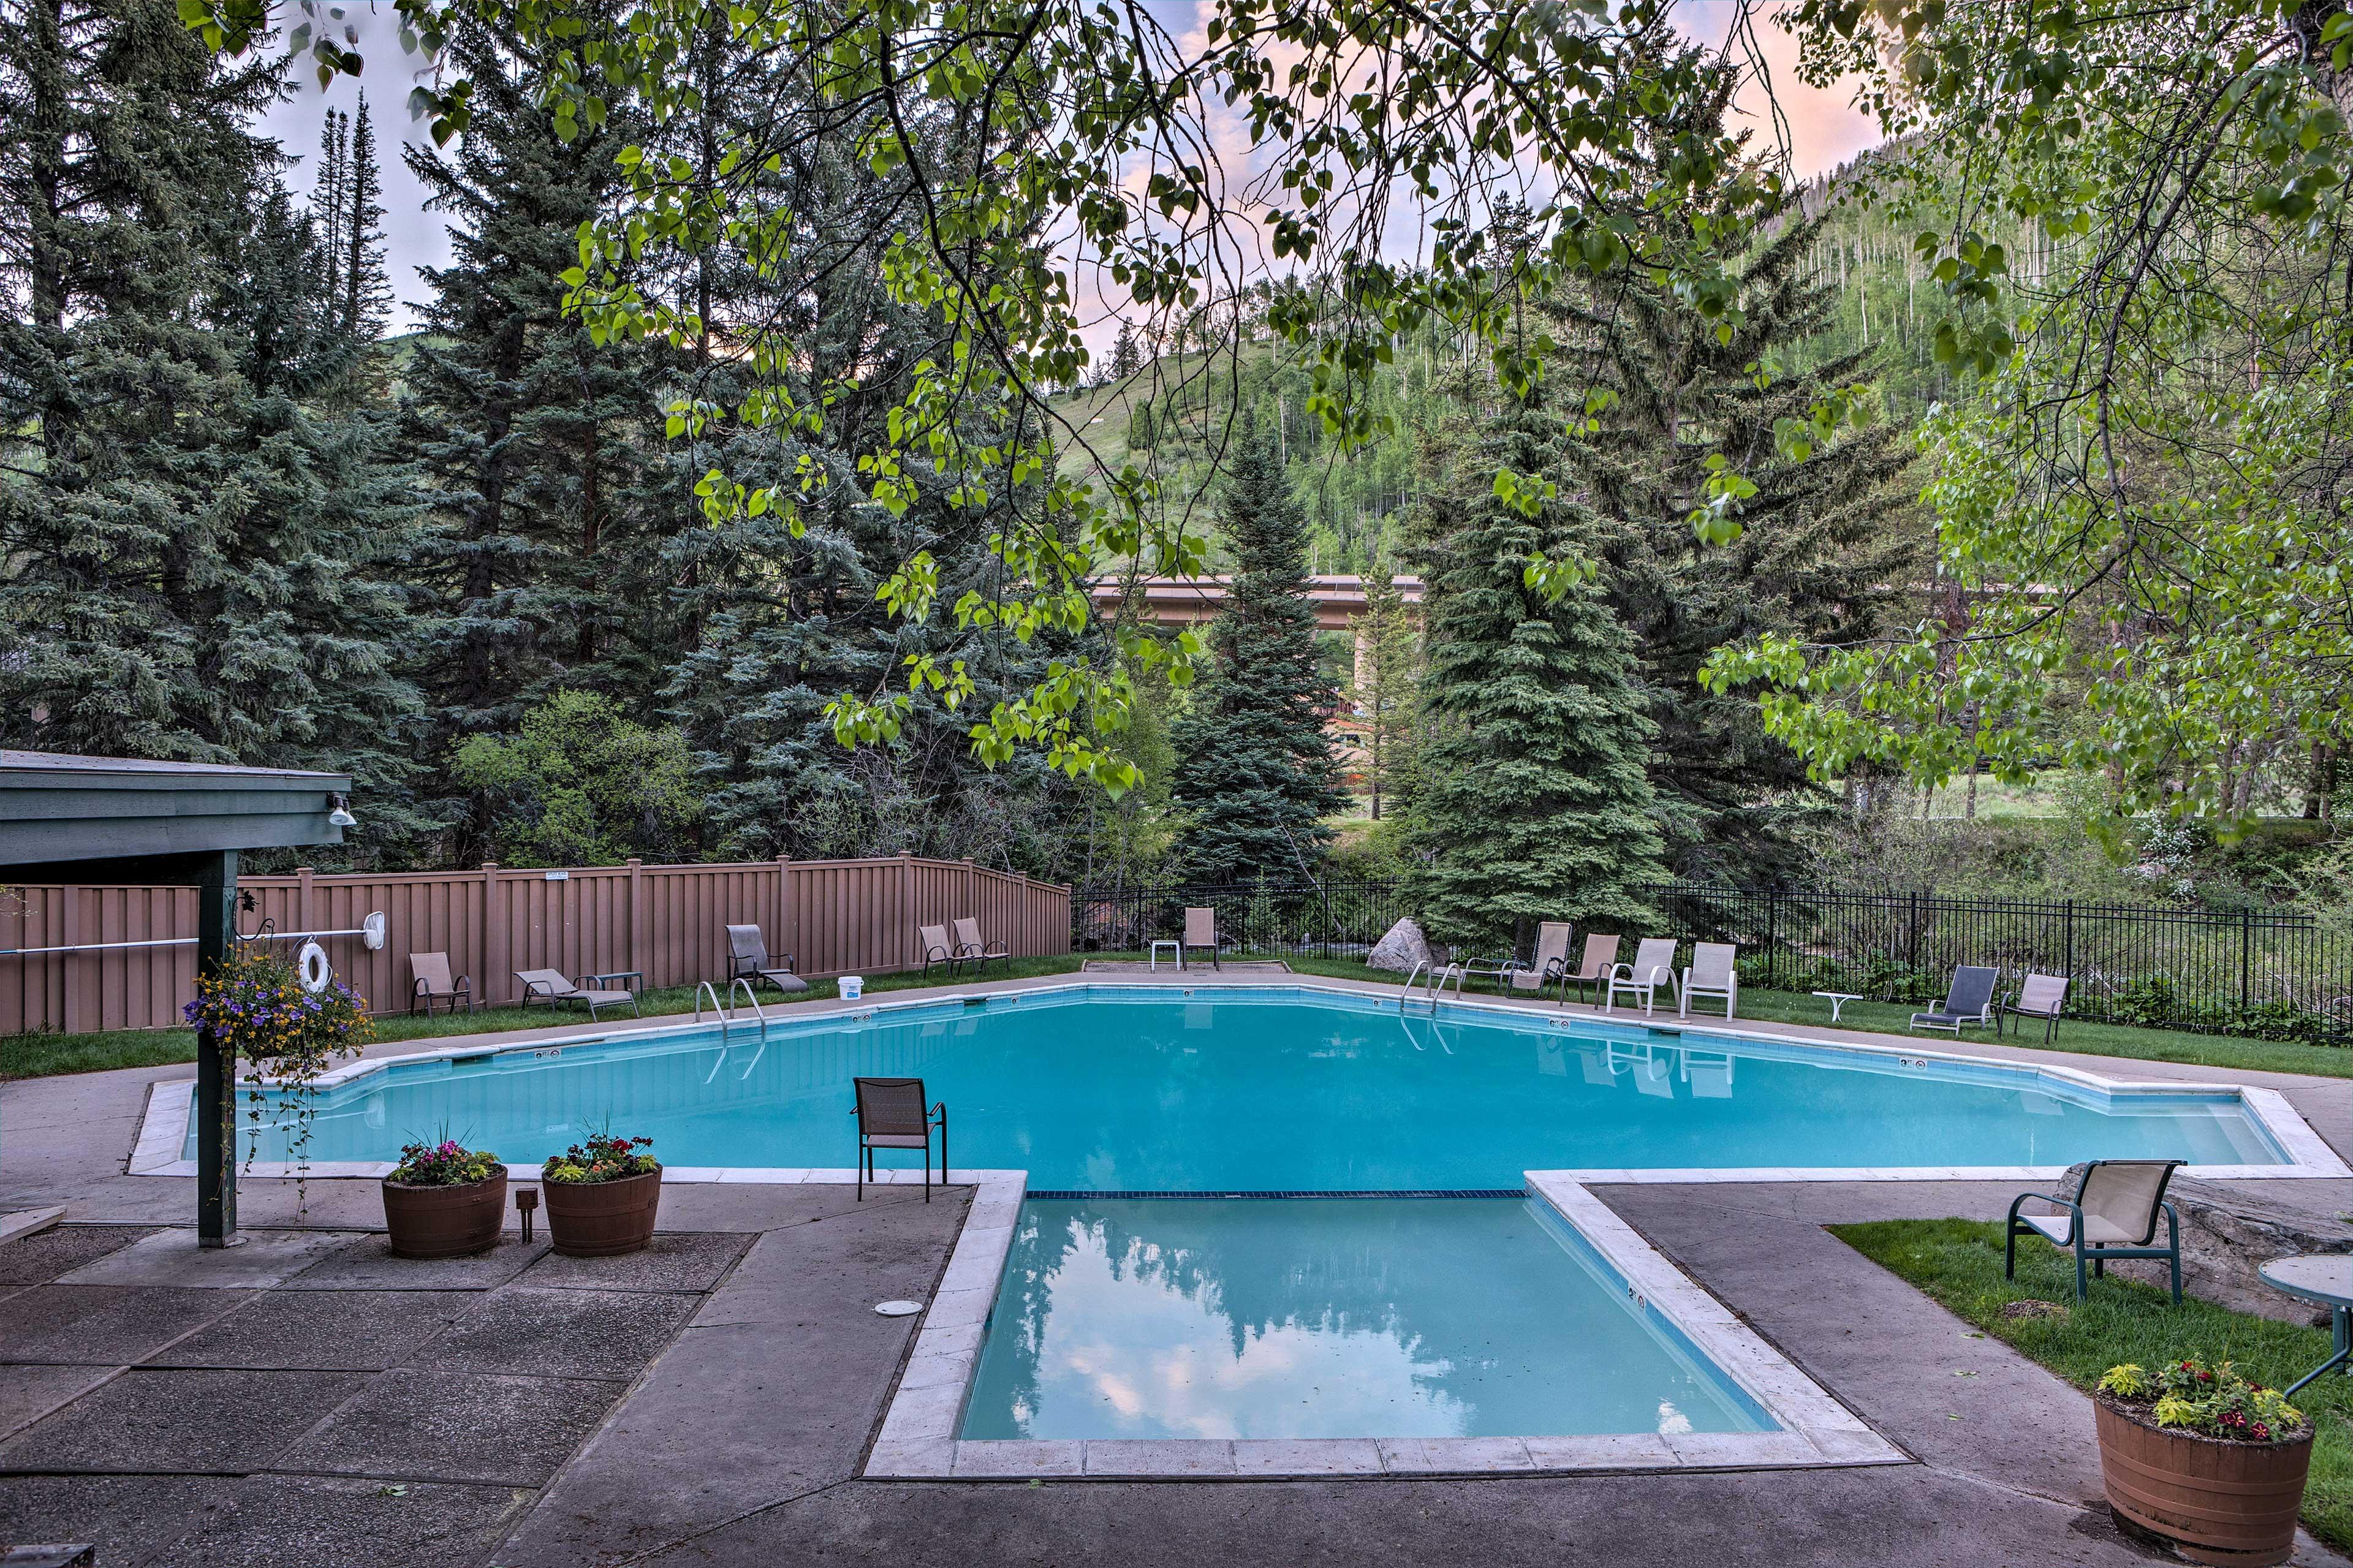 Beat the heat by splashing around in the pool.